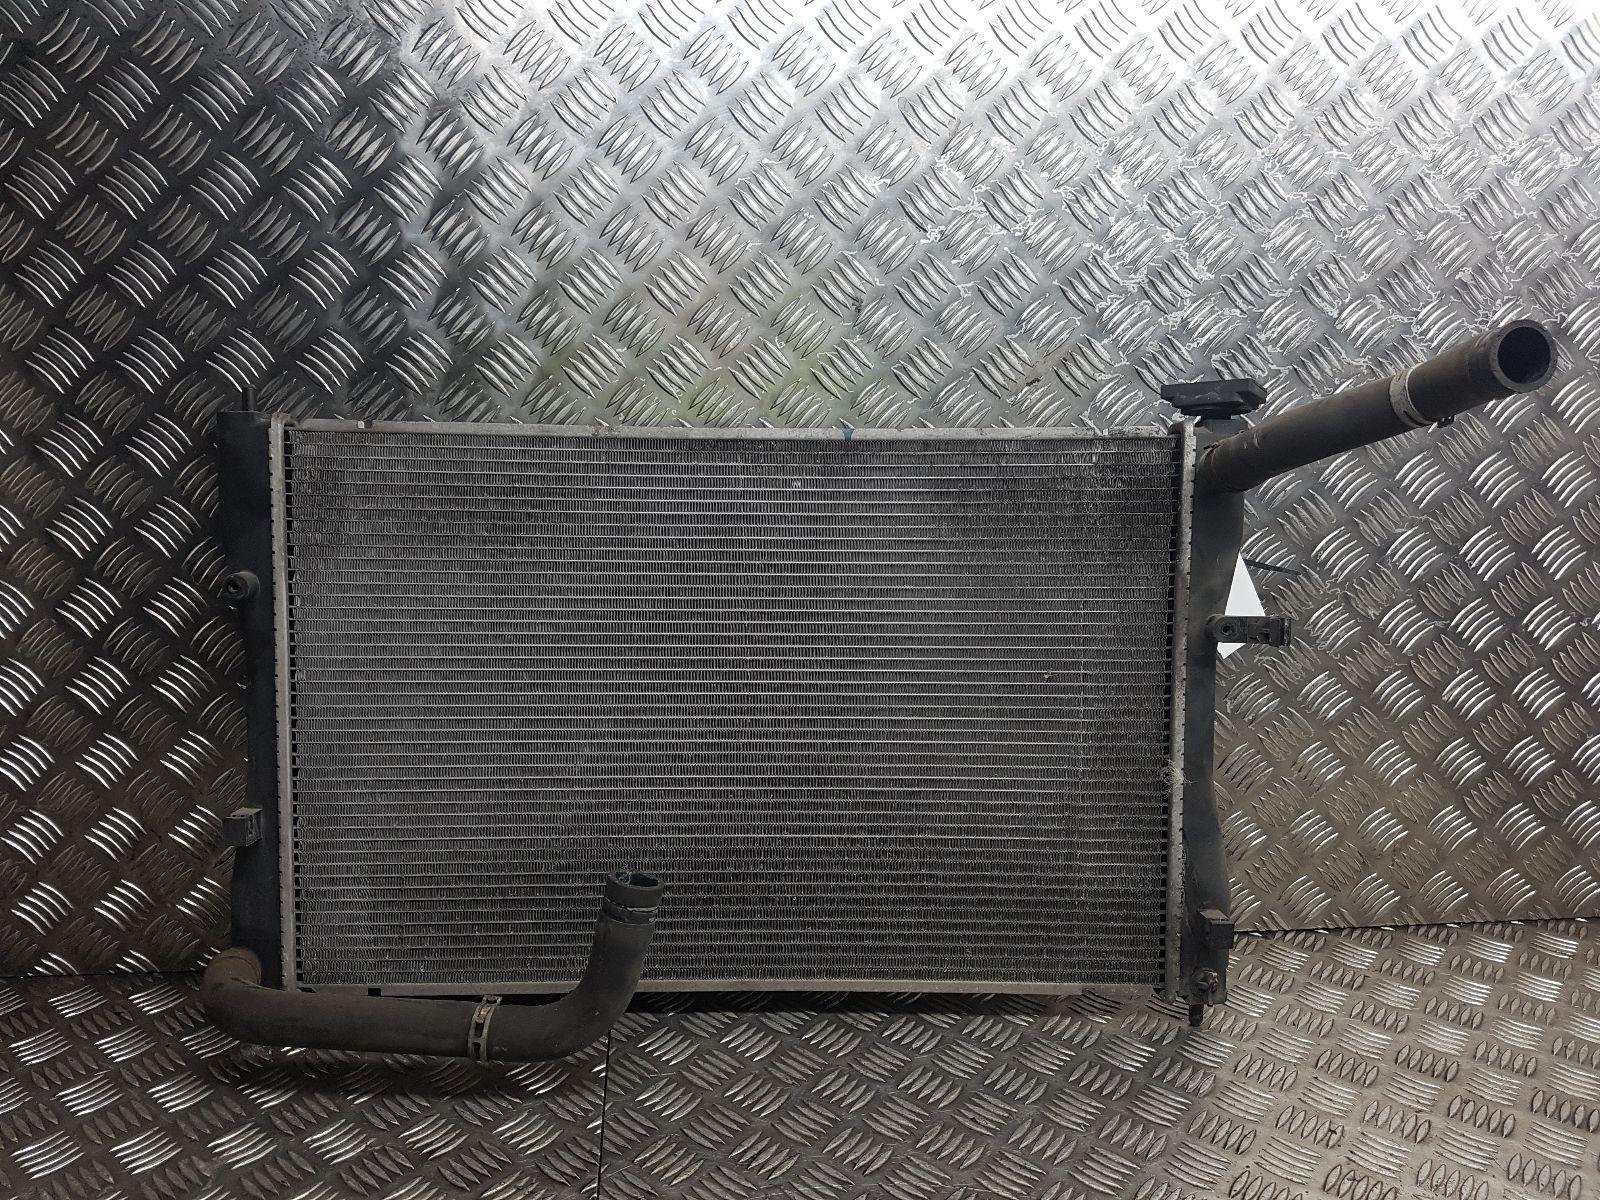 Mitsubishi Colt 2006 To 2008 Radiator (Diesel / Manual) for